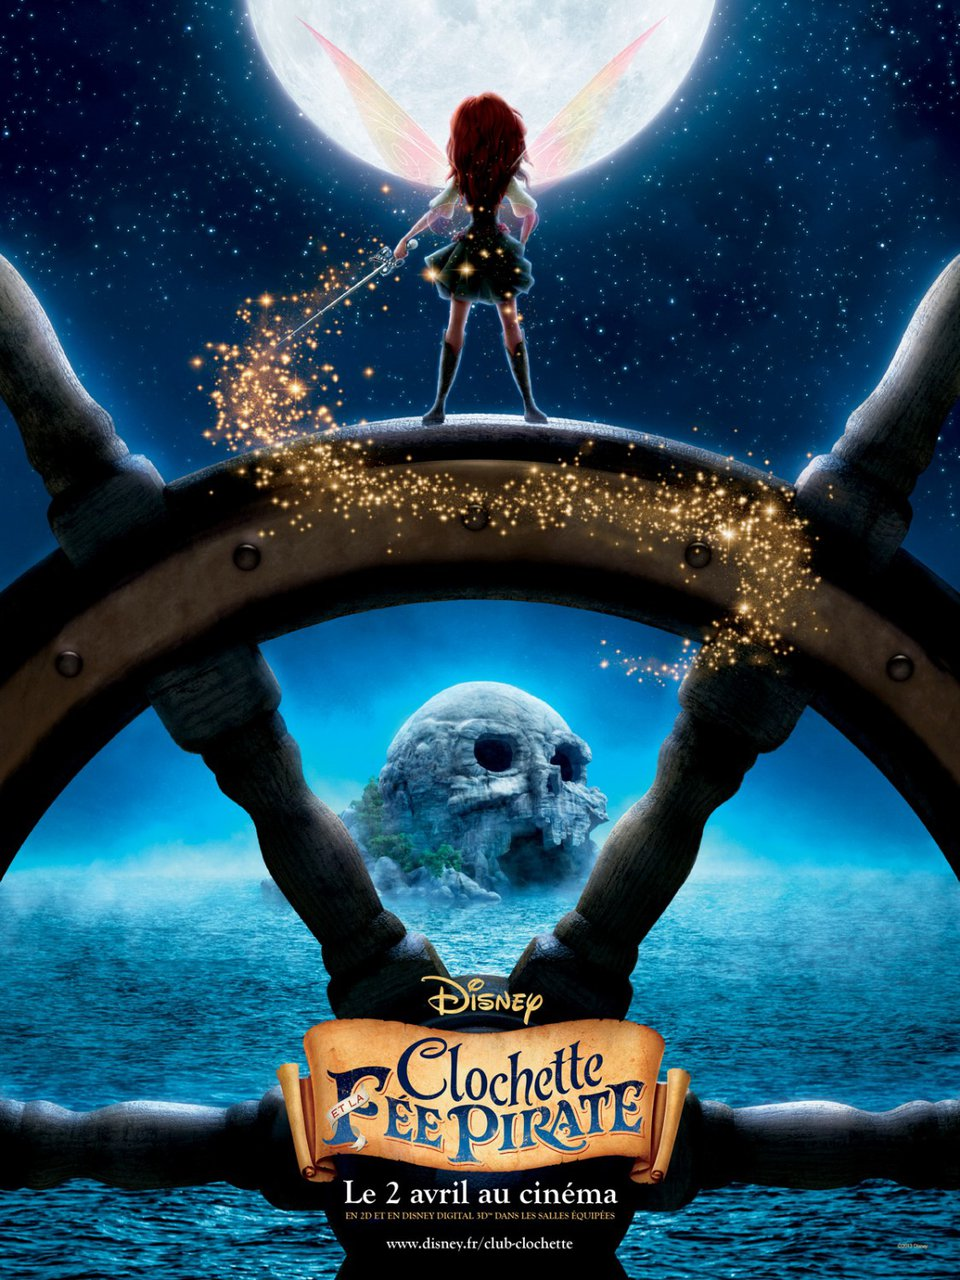 Феи пиратского острова смотреть онлайн 10